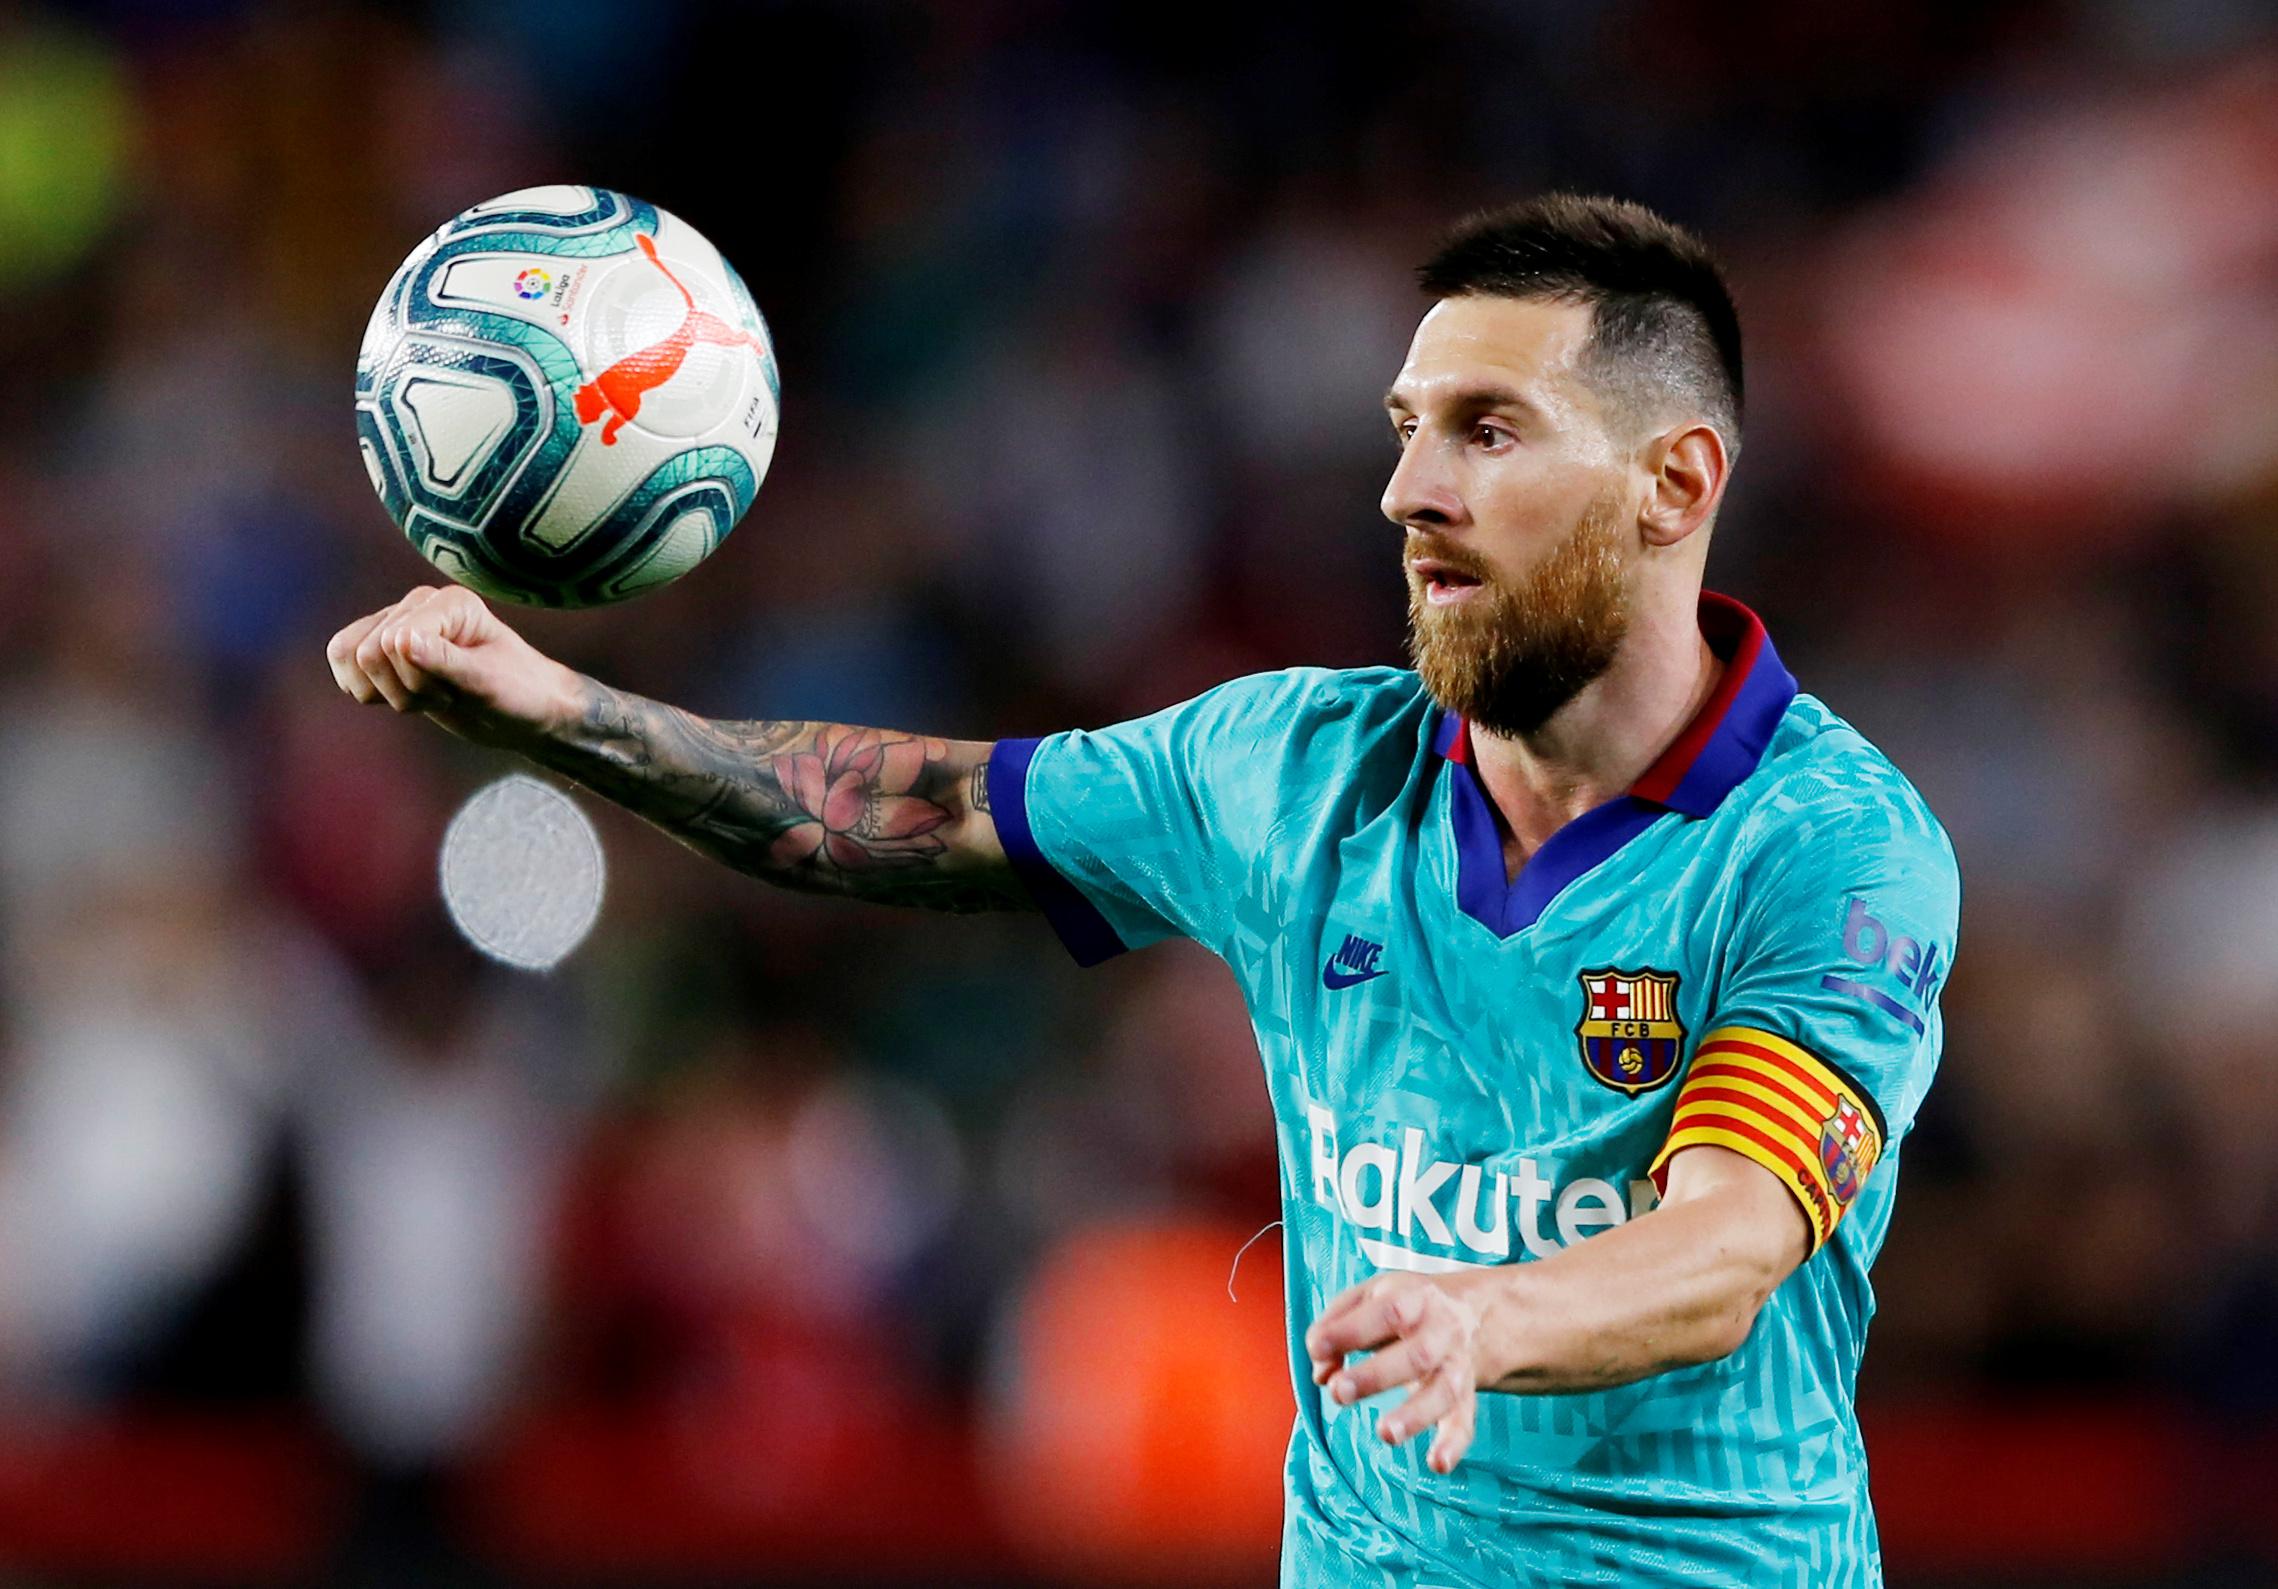 La Liga president Javier Tebas admits Lionel Messi mistreatment in tax fraud case